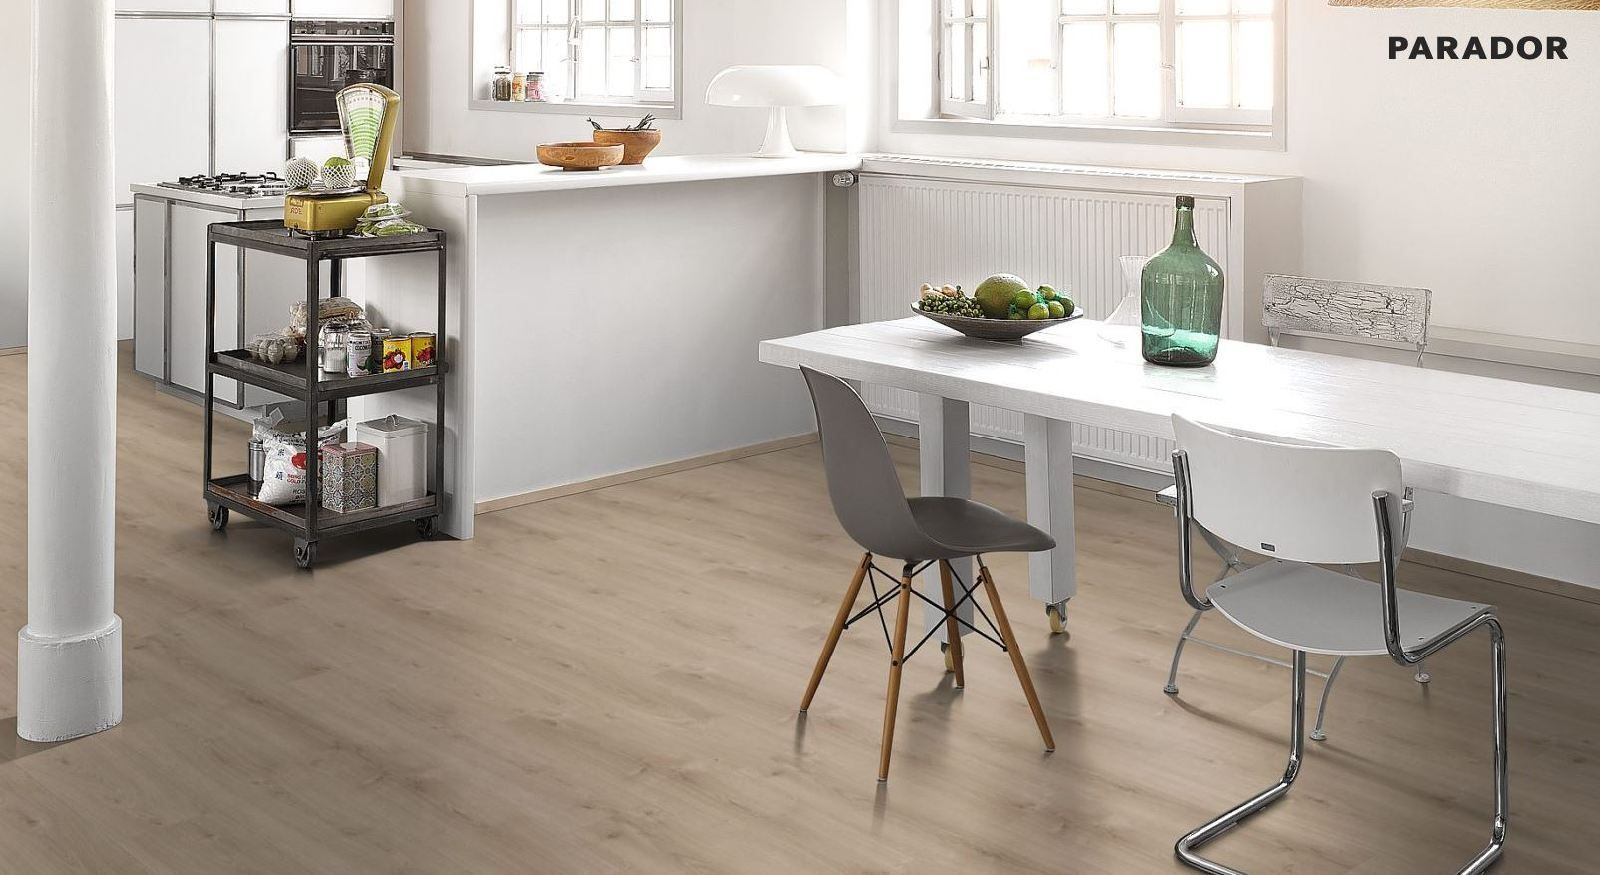 linoleum in holzoptik stilvolle linoleum in holzoptik linoleum holzoptik klick linoleum. Black Bedroom Furniture Sets. Home Design Ideas